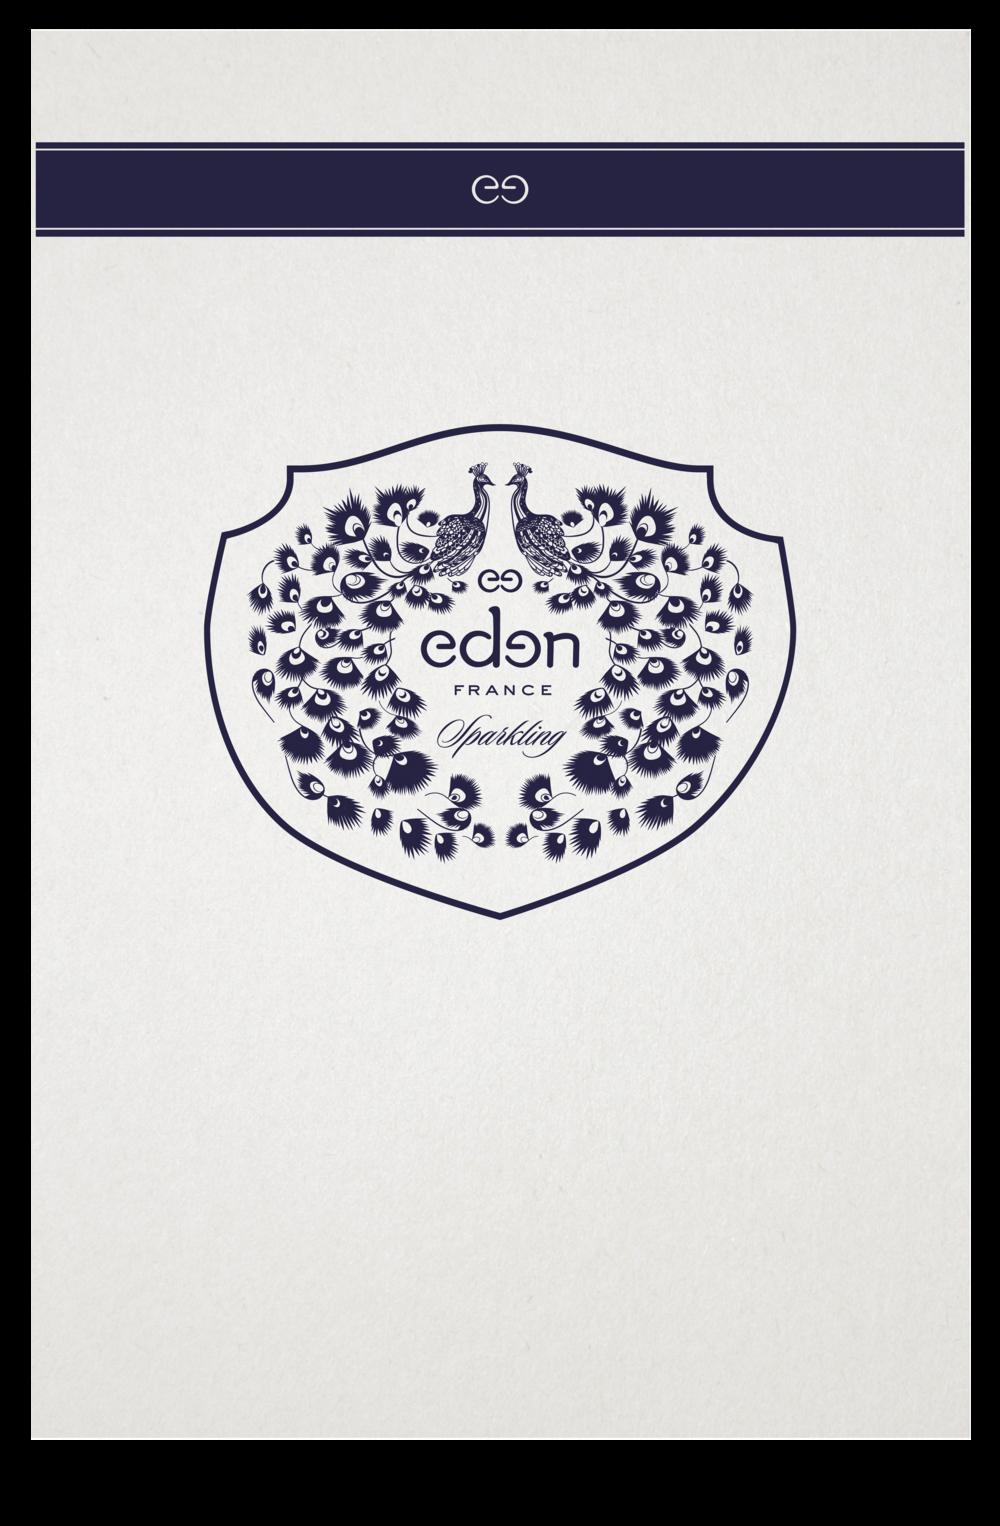 Eden+Box+transparent.png